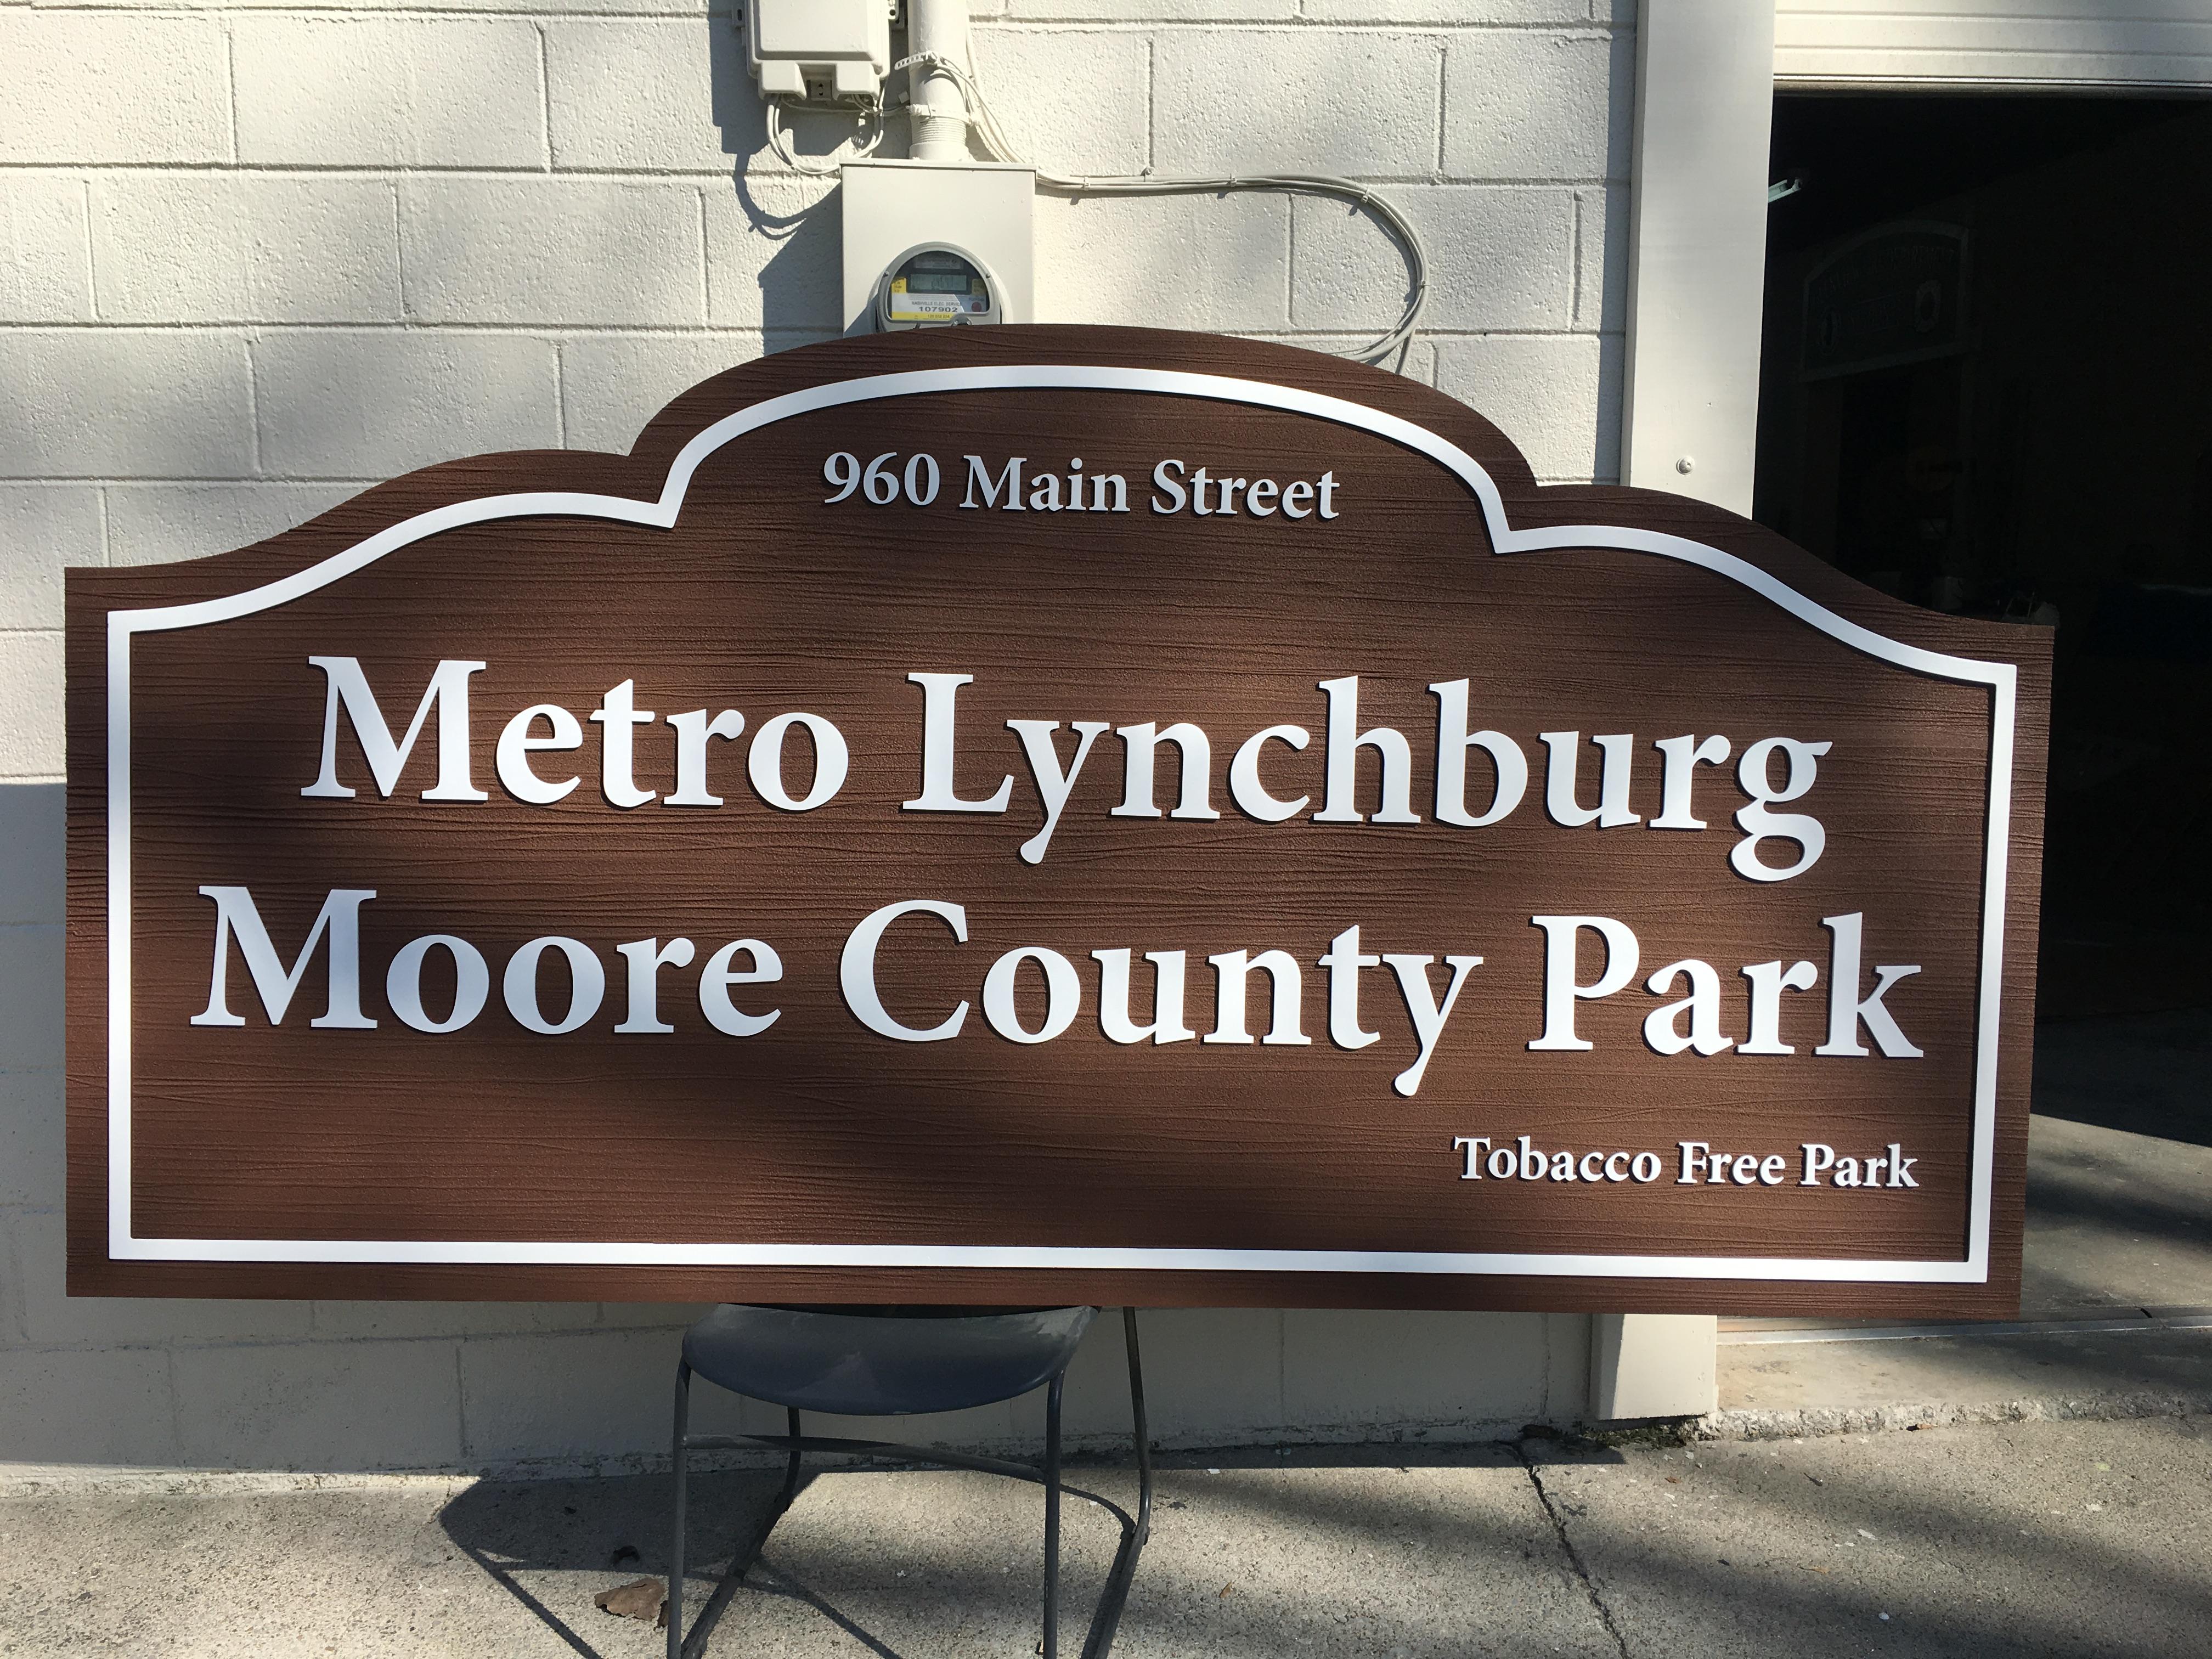 Metro Lynchburg Moore County Park